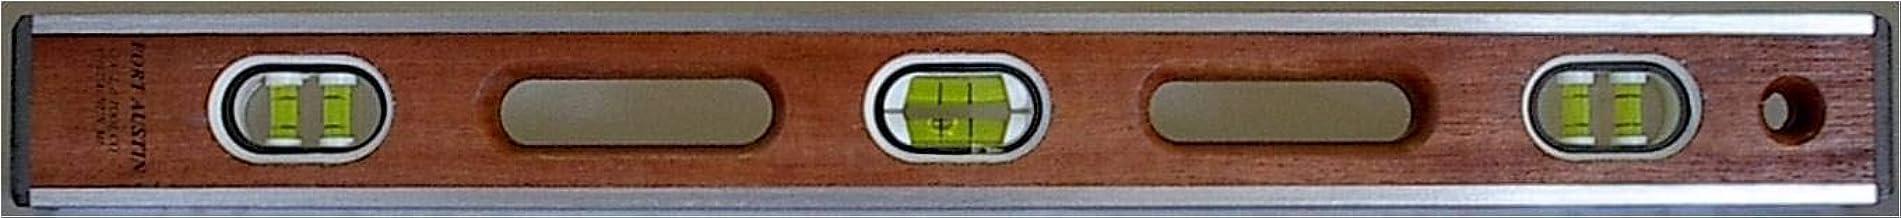 "product image for Port Austin Level & Tool Mfg. Co. Port Austin Level Mason Wood/Alum I-beam 24"" Level"